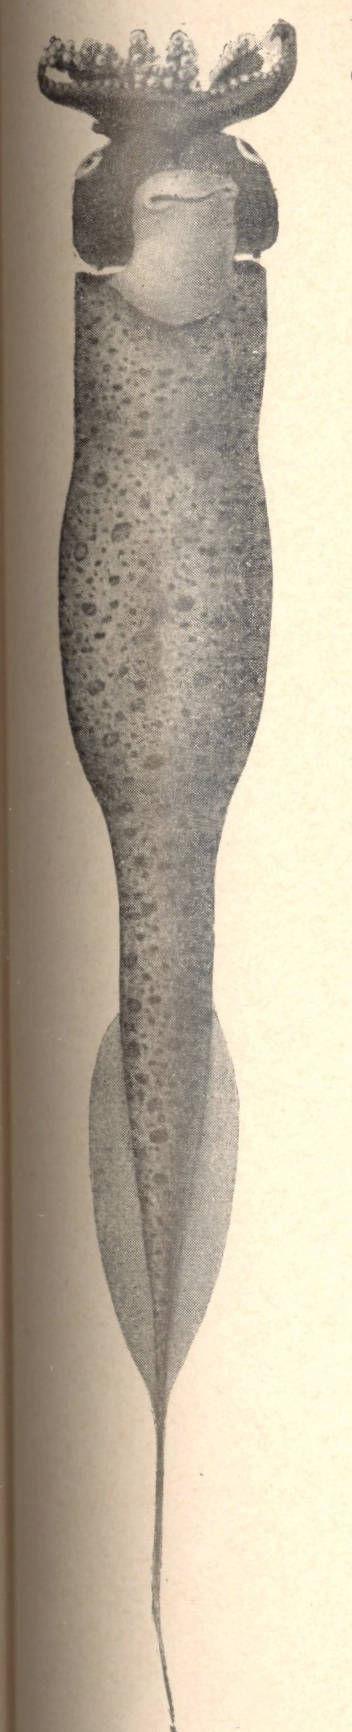 Image of Taonius Steenstrup 1861